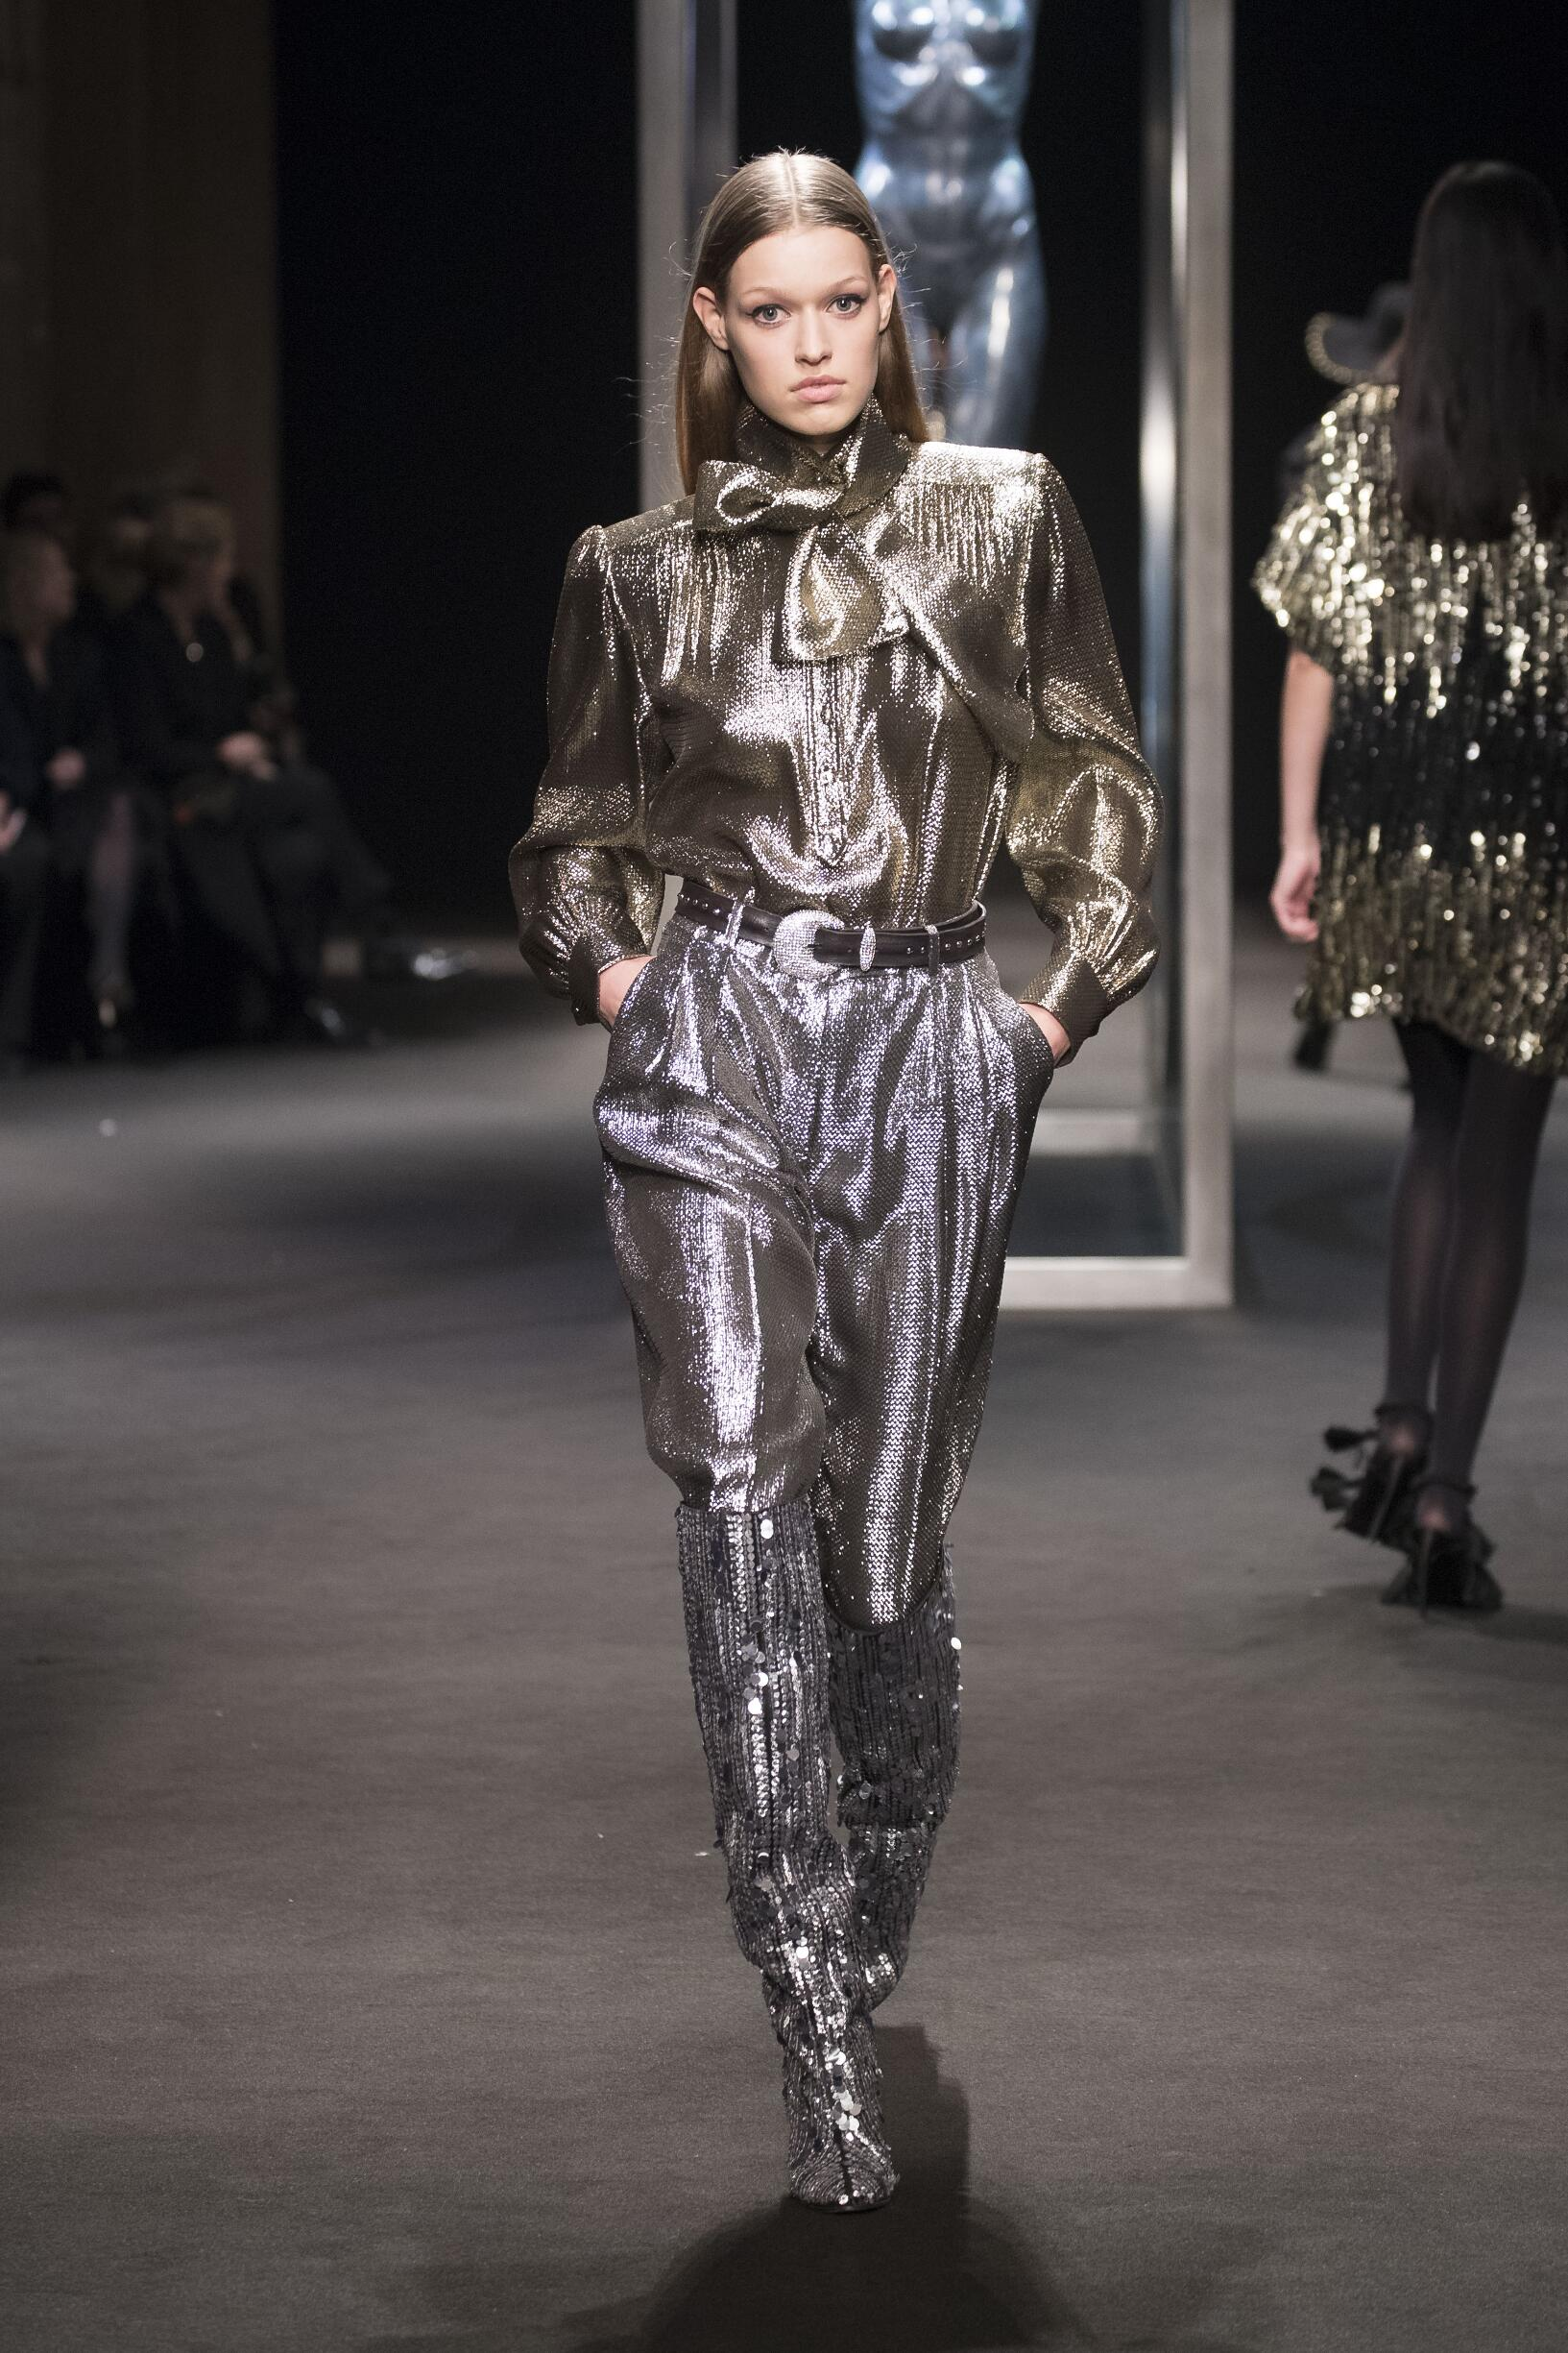 Fall Fashion Woman Trends 2018 Alberta Ferretti